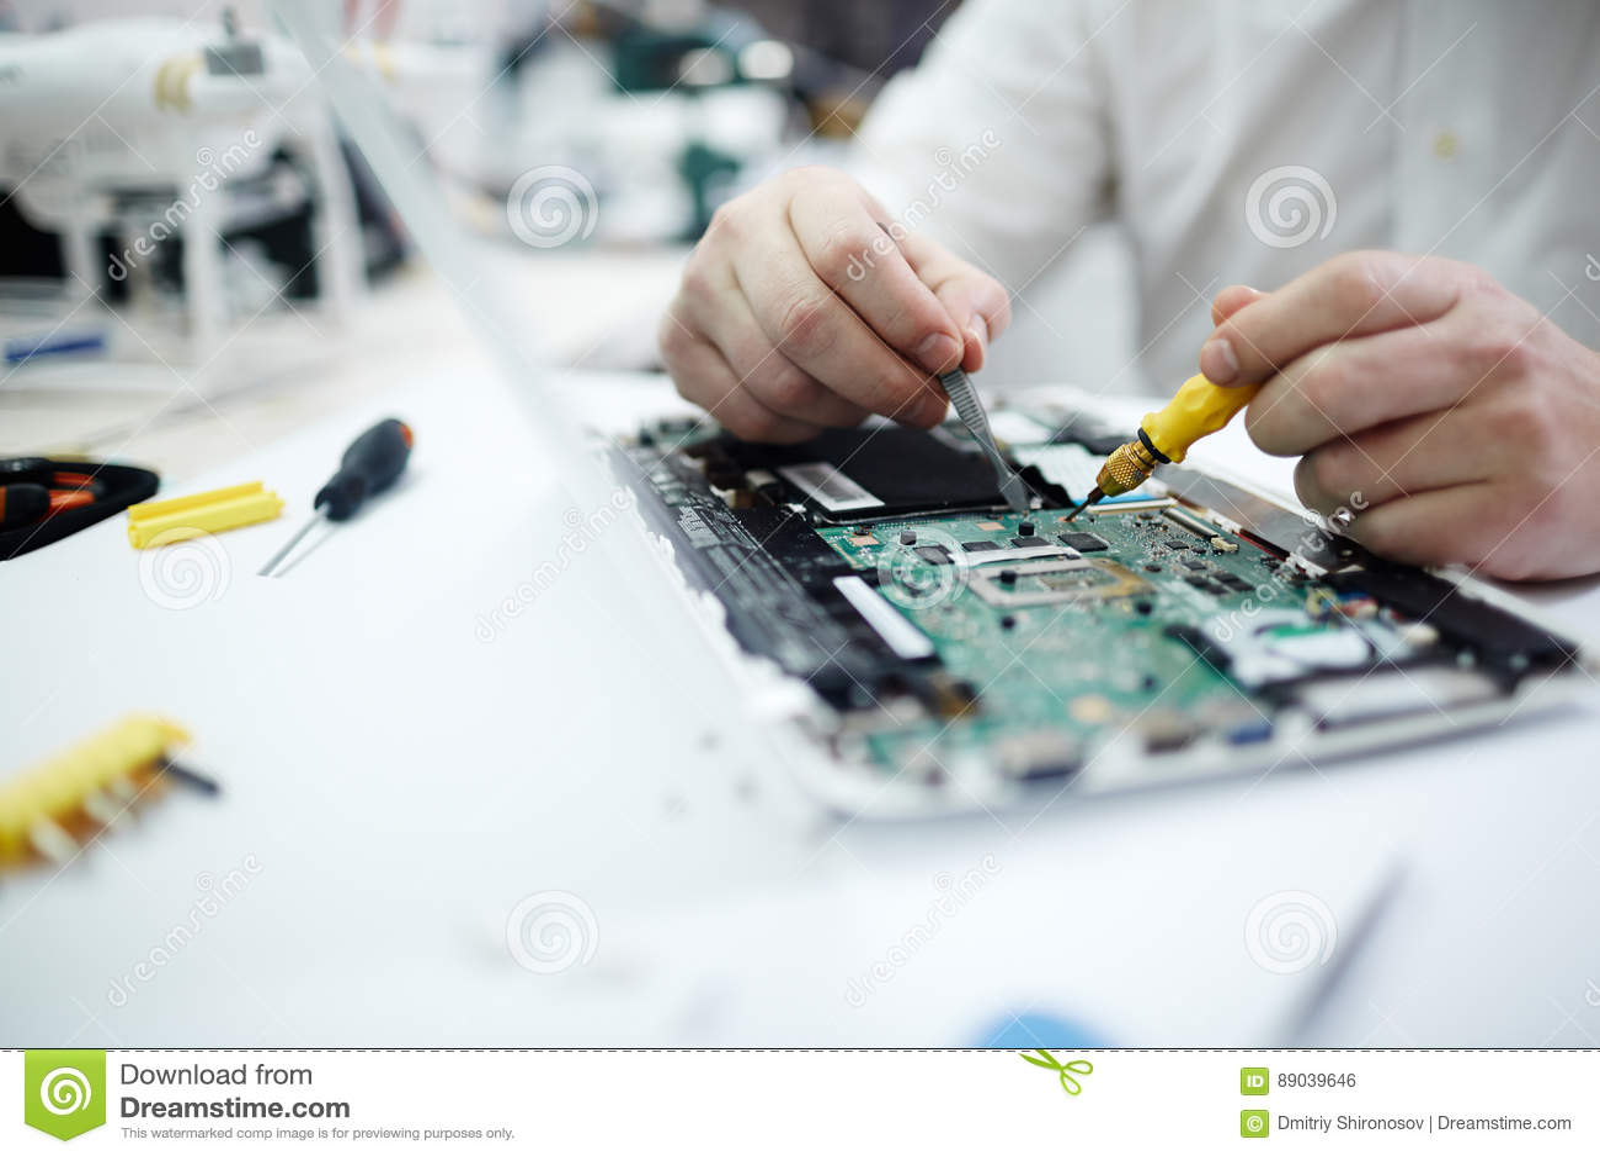 Man Repairing Circuit Board In Laptop Stock Photo Image Of Computer Royalty Free